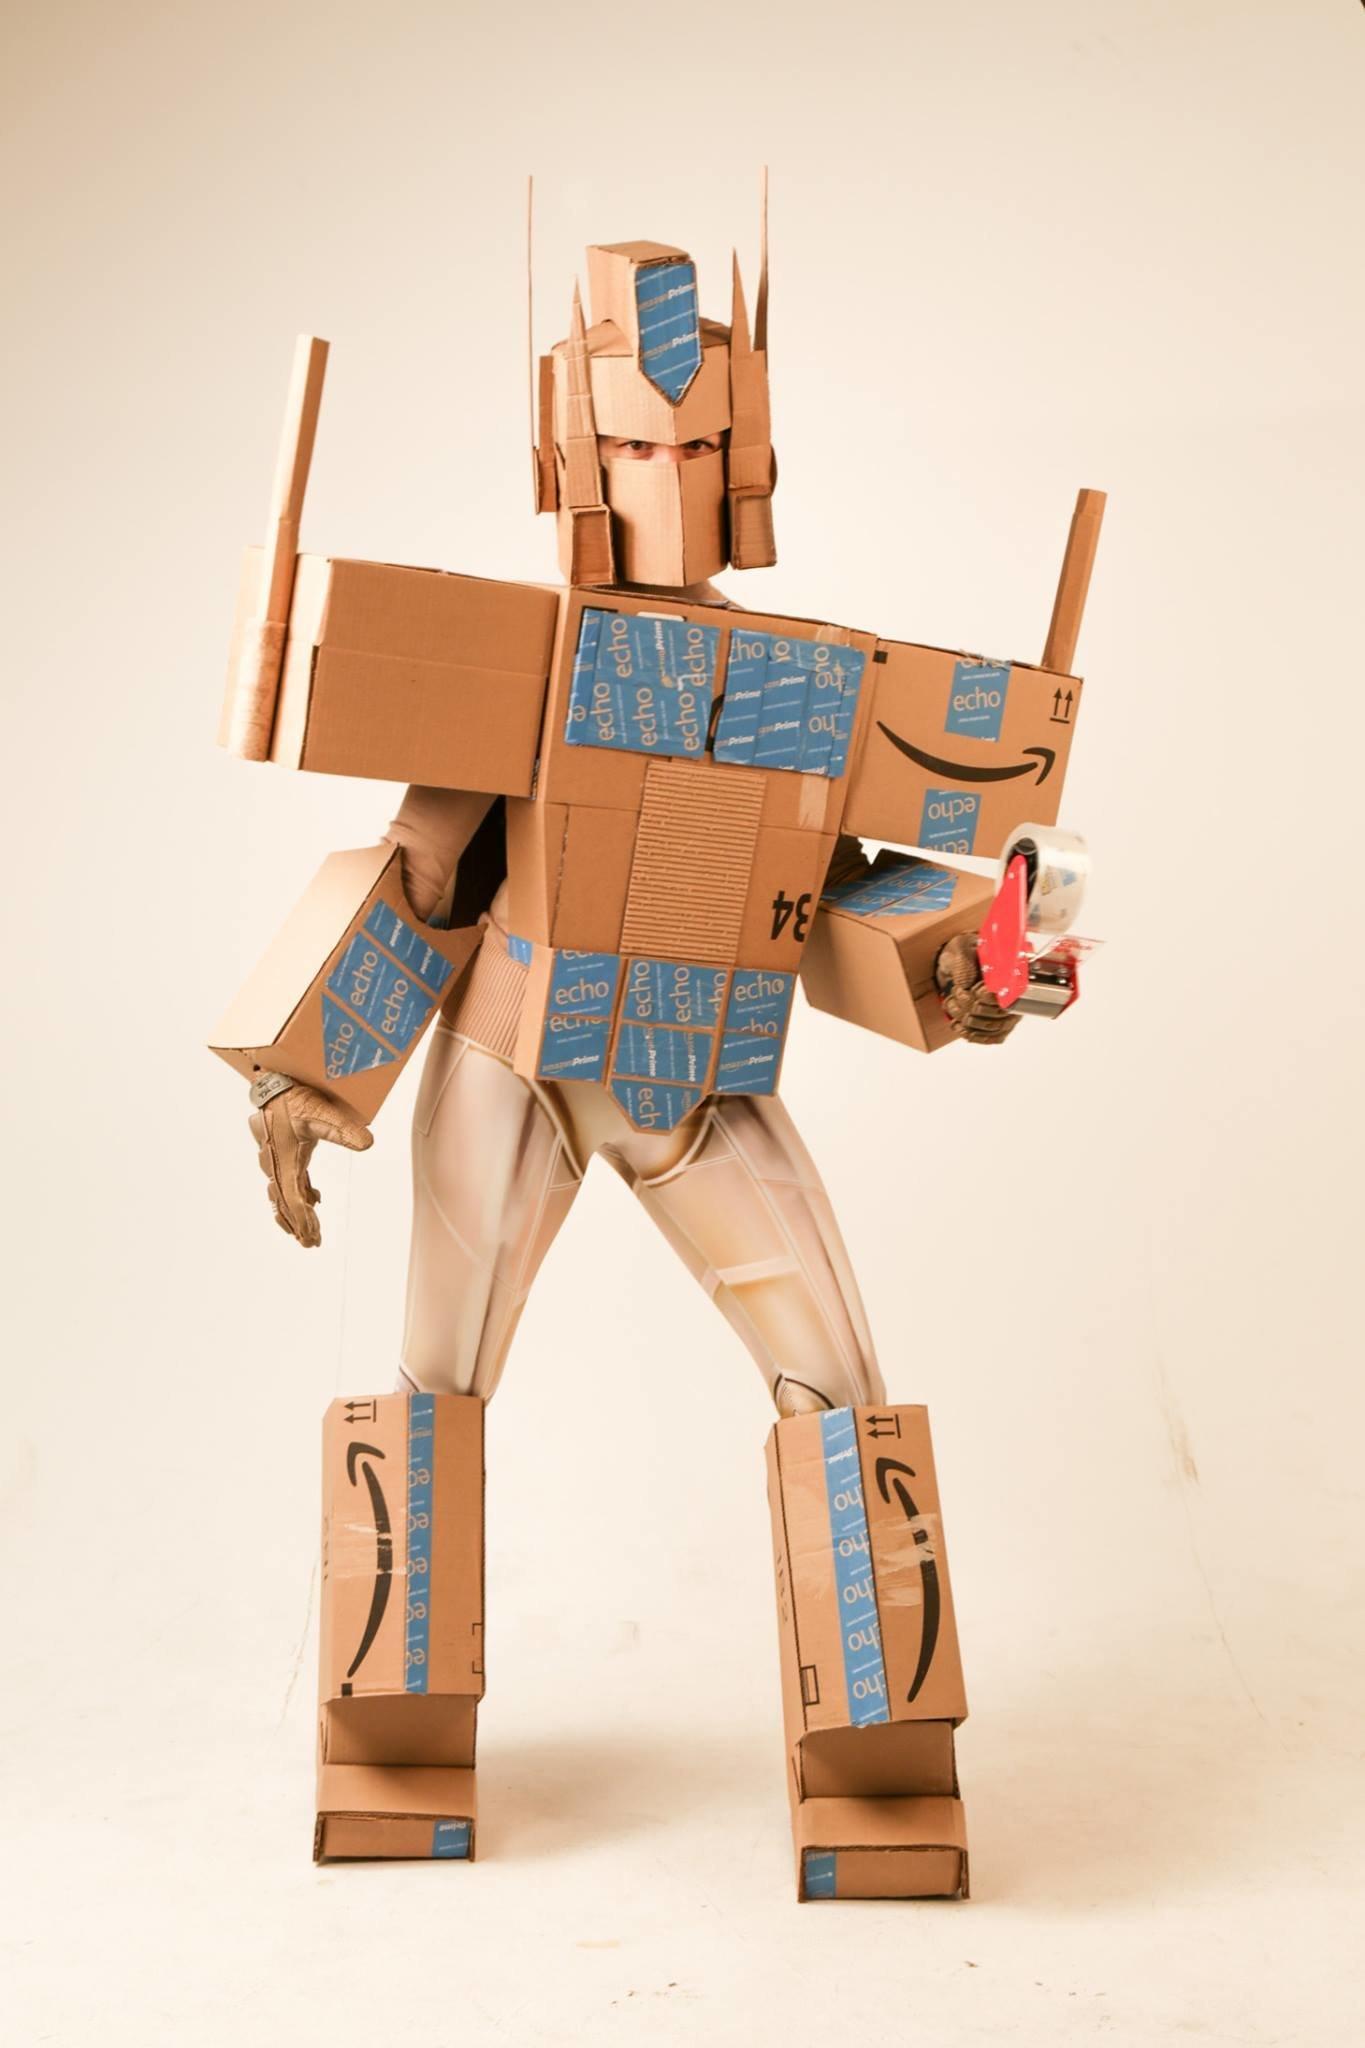 amazon costume. jason hackettfusion marketing amazon costume